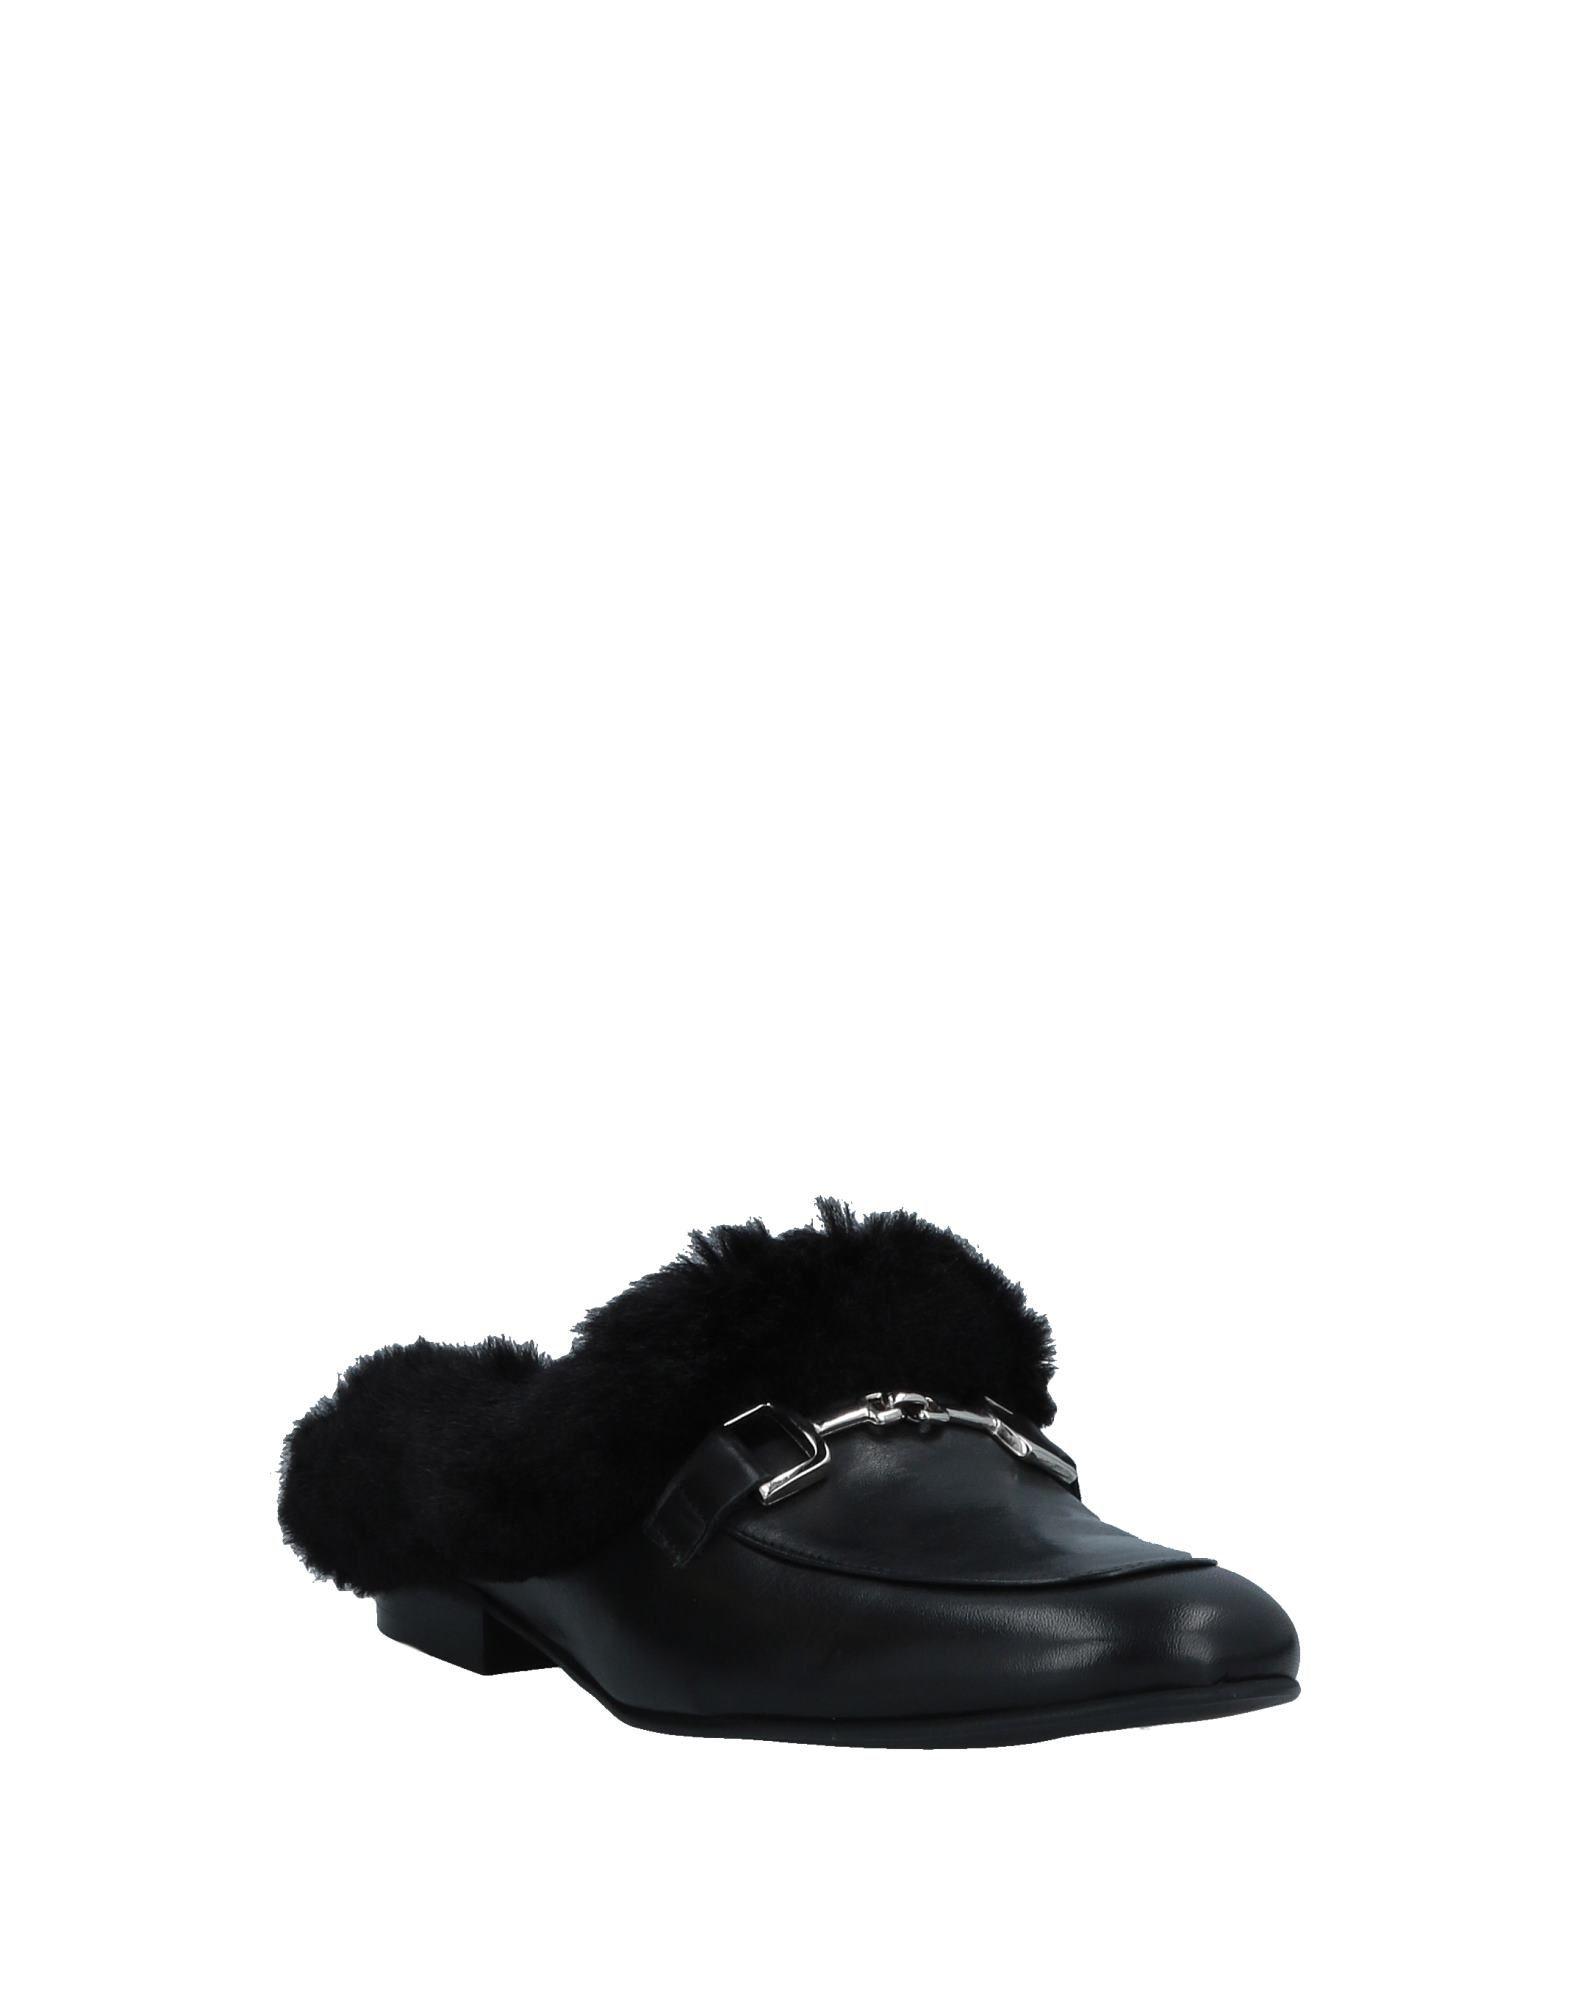 Onako' Pantoletten Damen Schuhe  11526184DXGut aussehende strapazierfähige Schuhe Damen 002e04